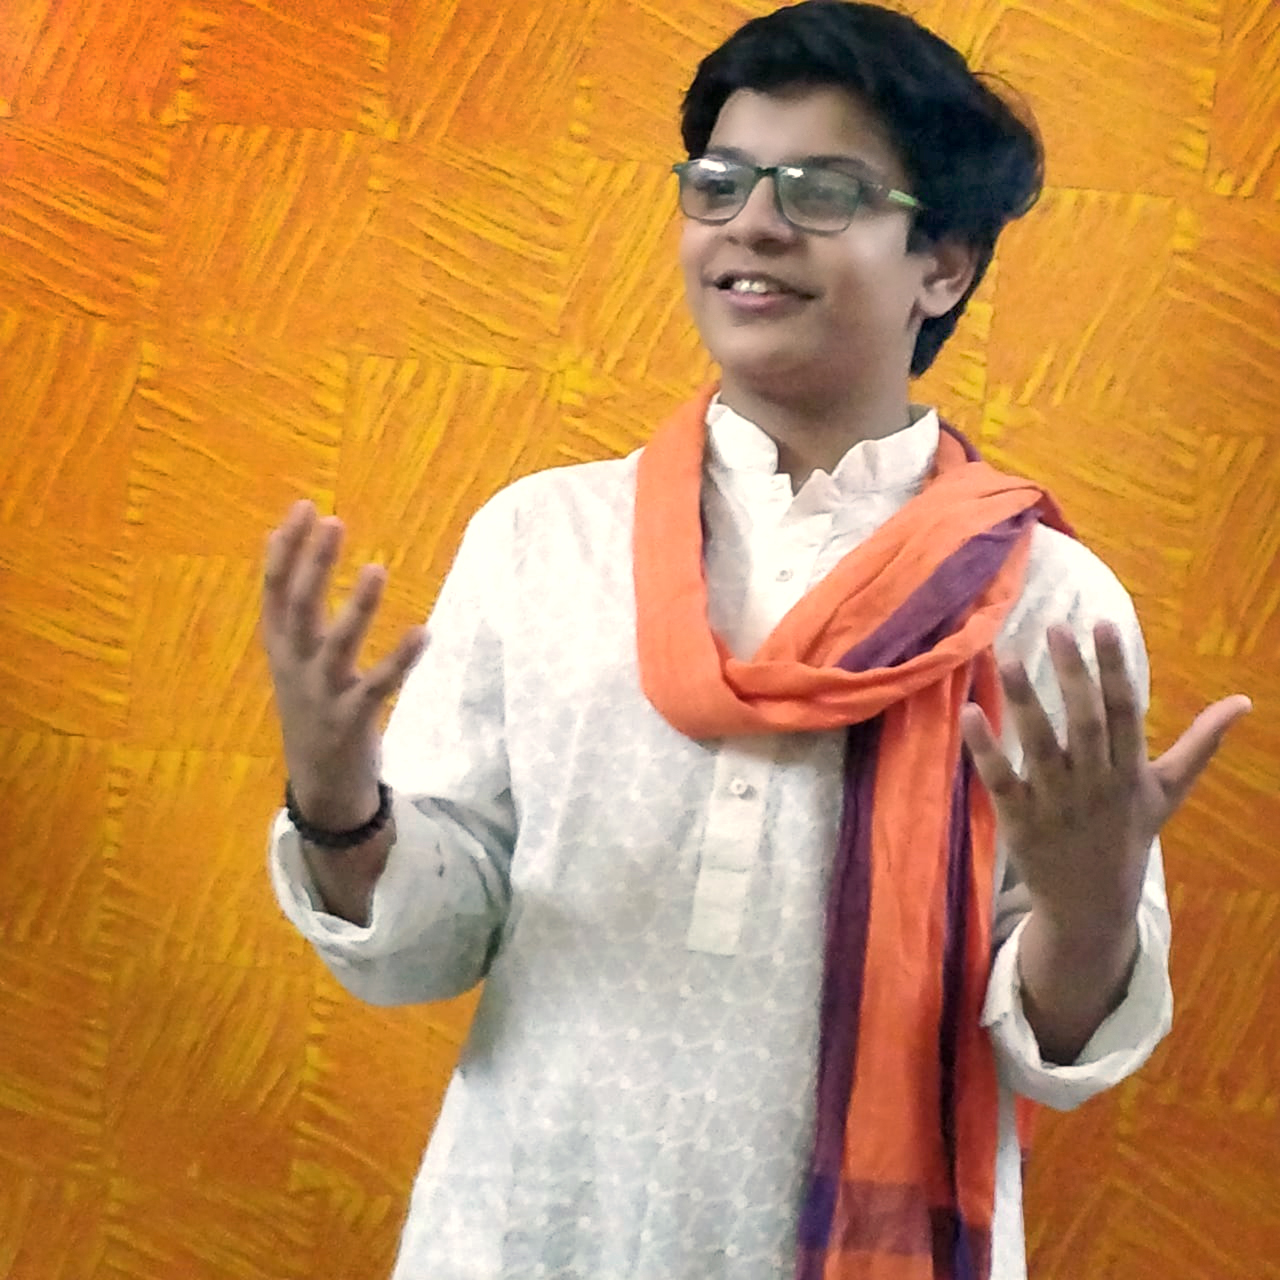 Hindi - Kahaani Apni Apni (Grade 3) 2020